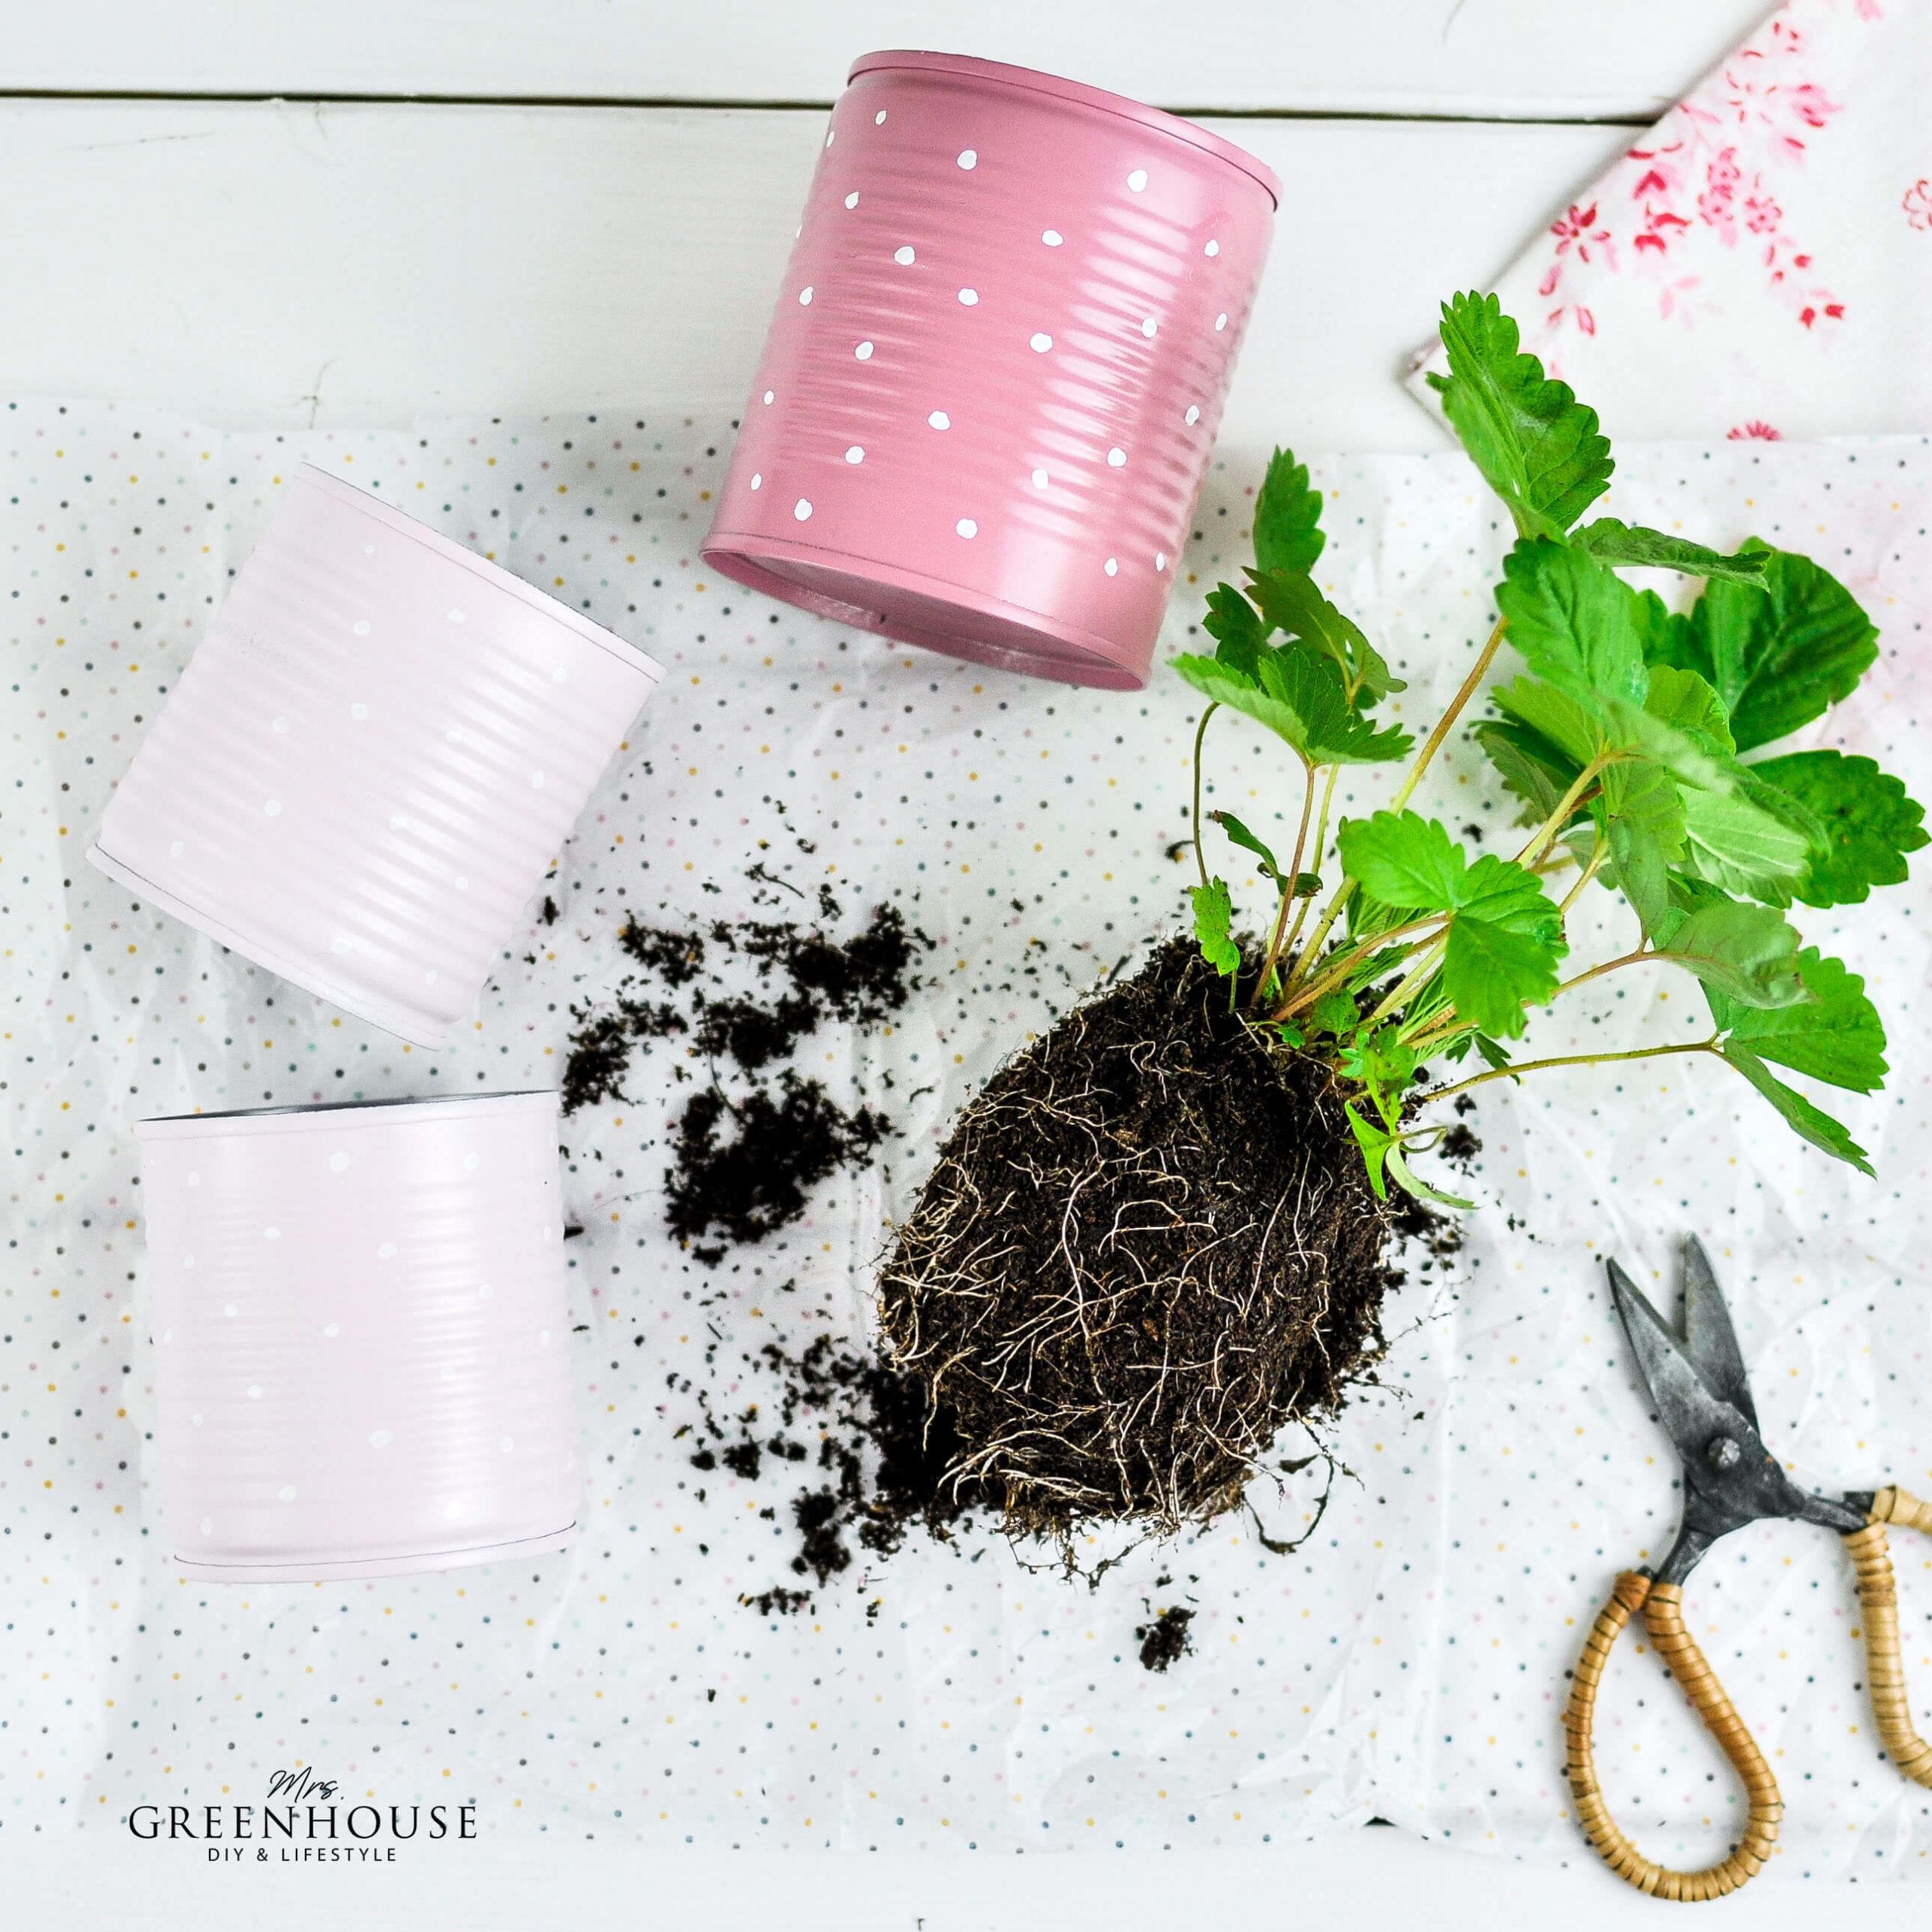 Dosen Upcycling im Erdbeer Design